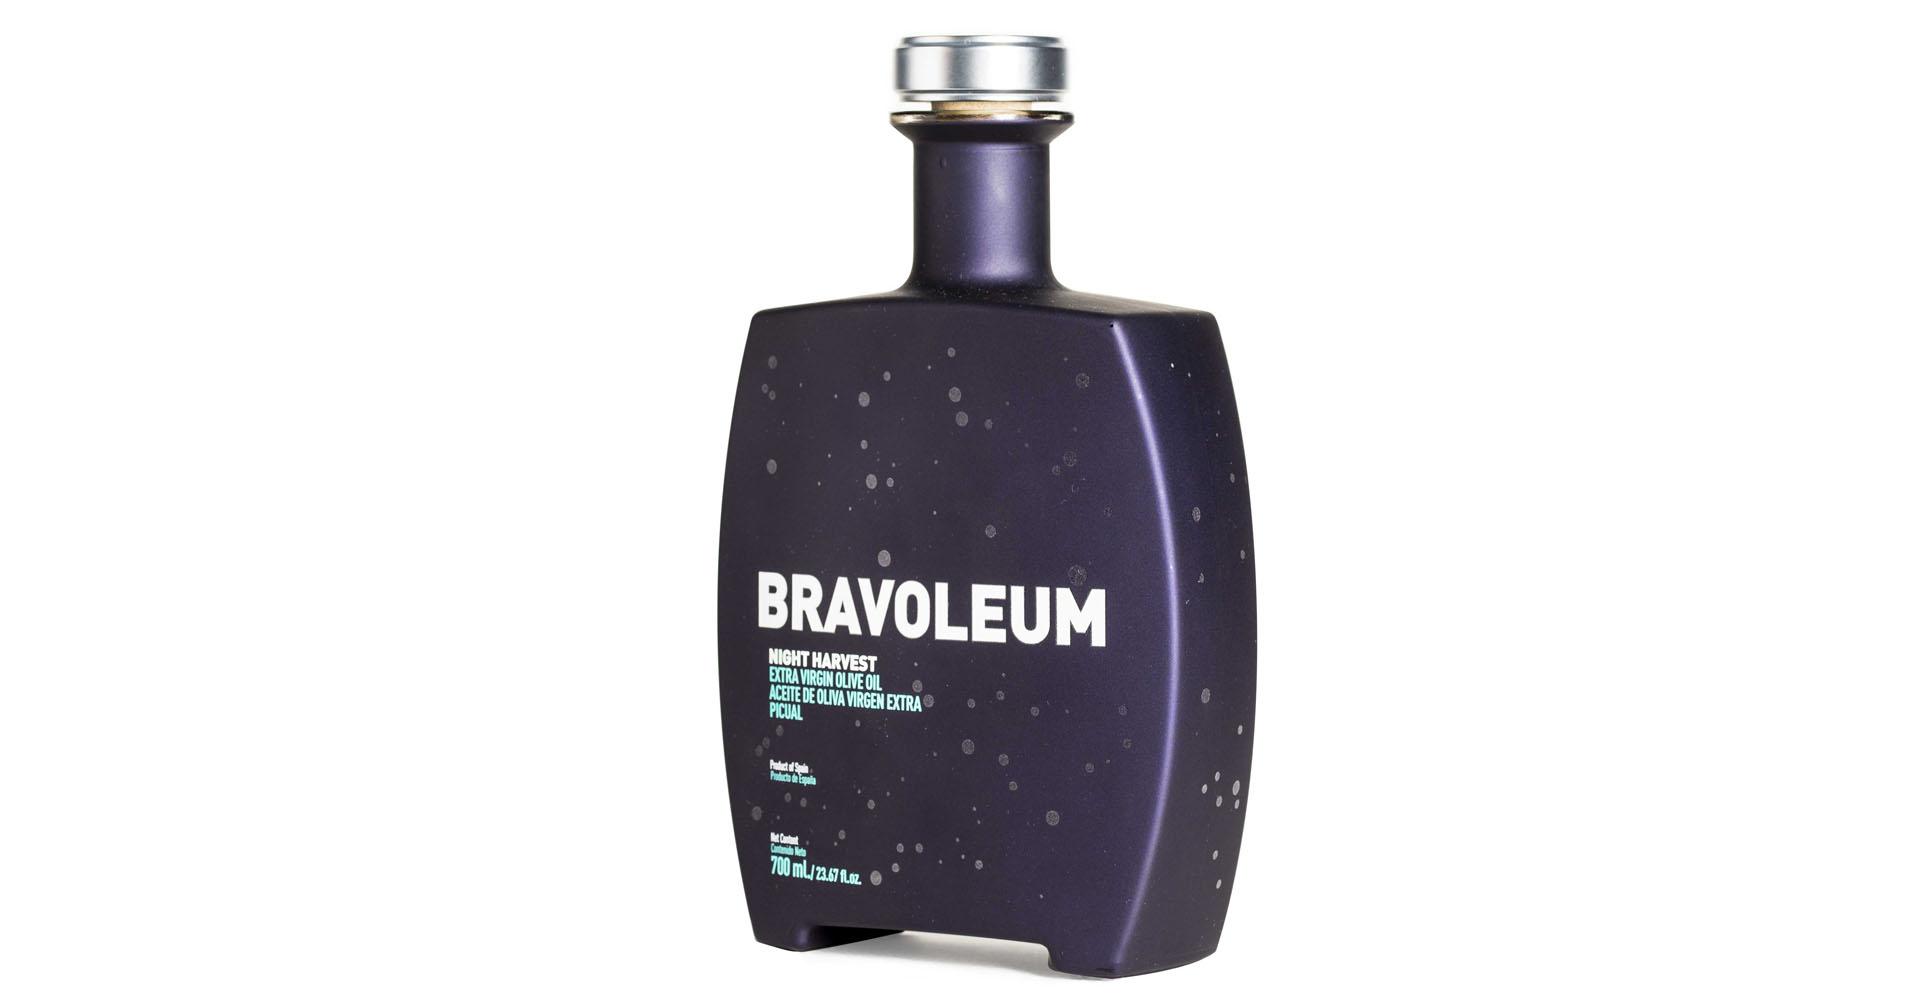 Bravoleum Night Harvest